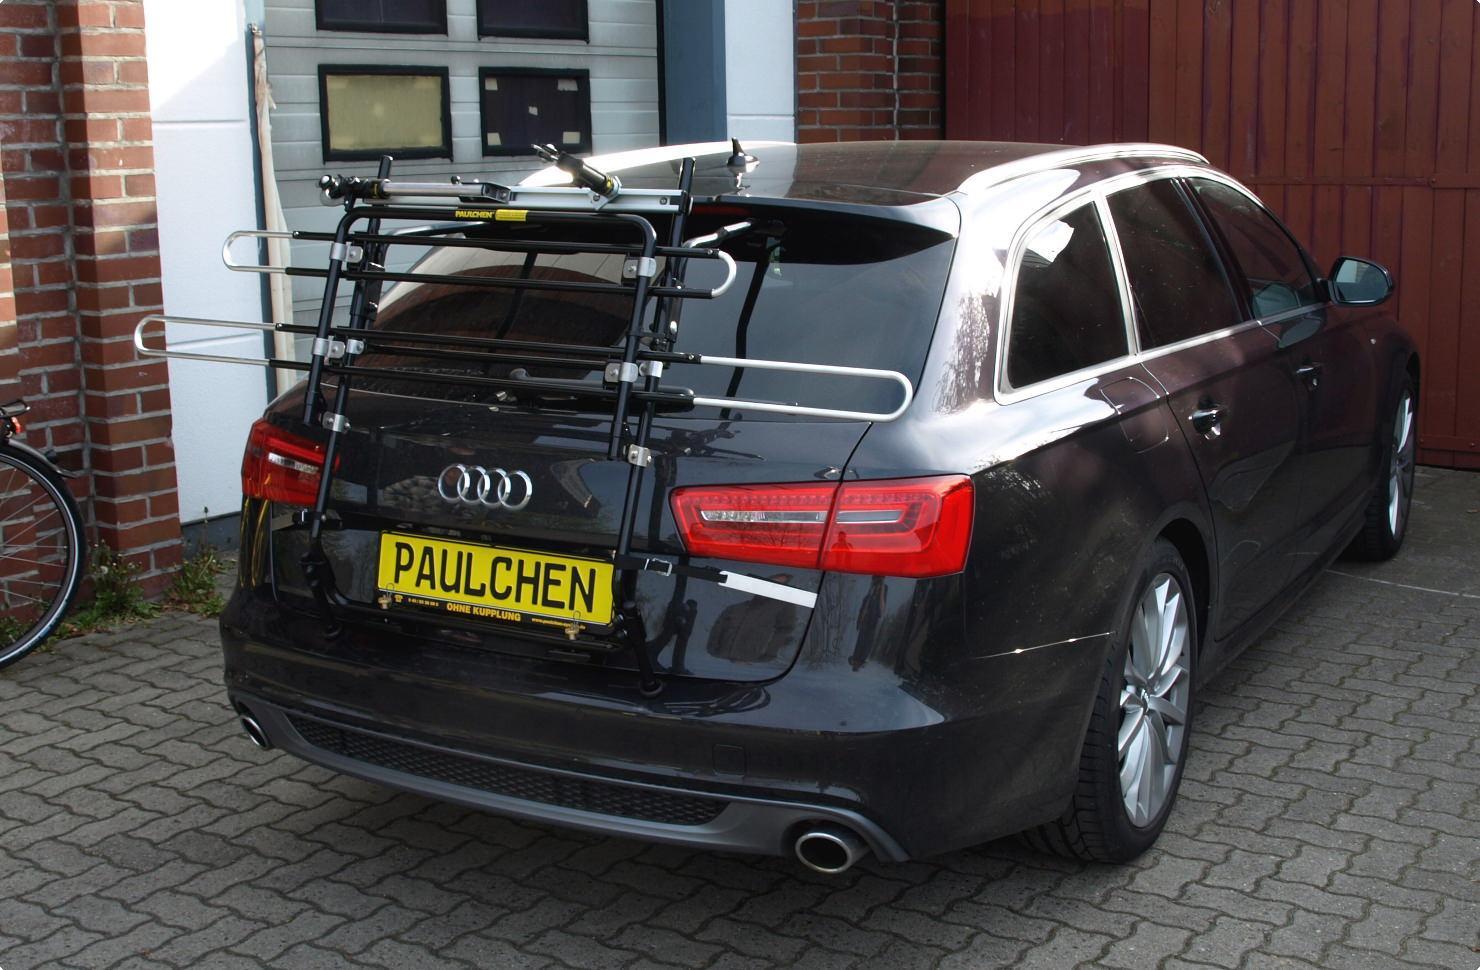 Bicycle Carrier For Audi A6 Avant C7 Paulchen